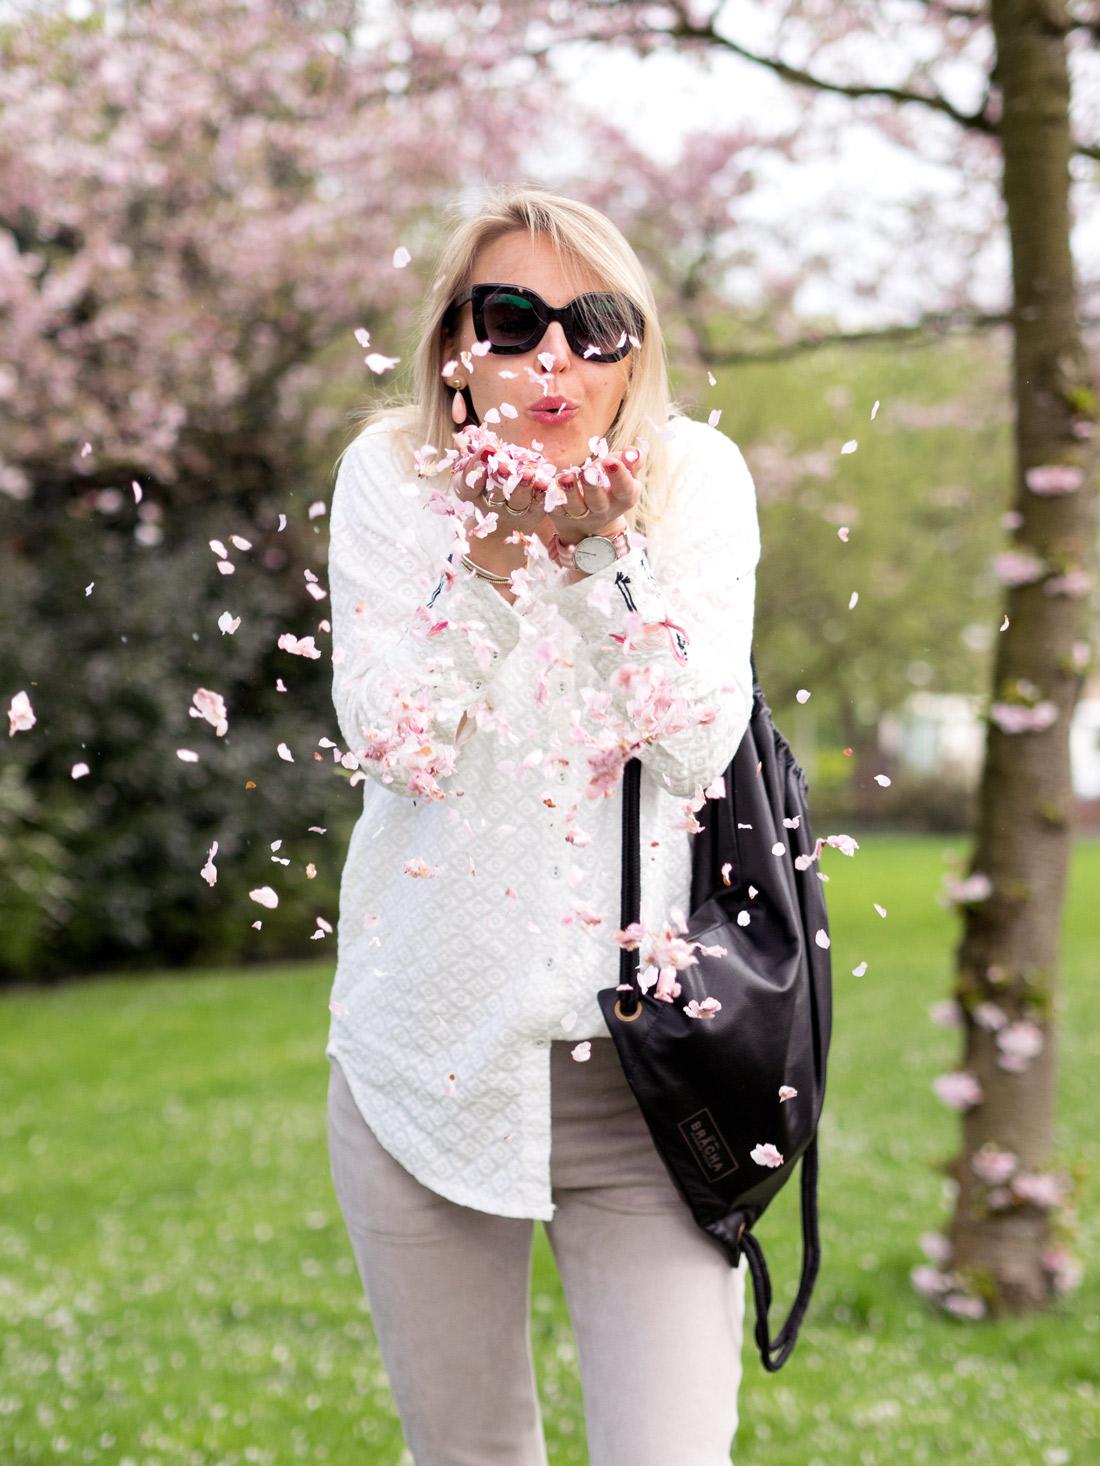 BAGATYOU_Susanne_Bavinck_Bender_Blogger_Fashion_Amsterdam_By_Marinke_Davelaar-Spring